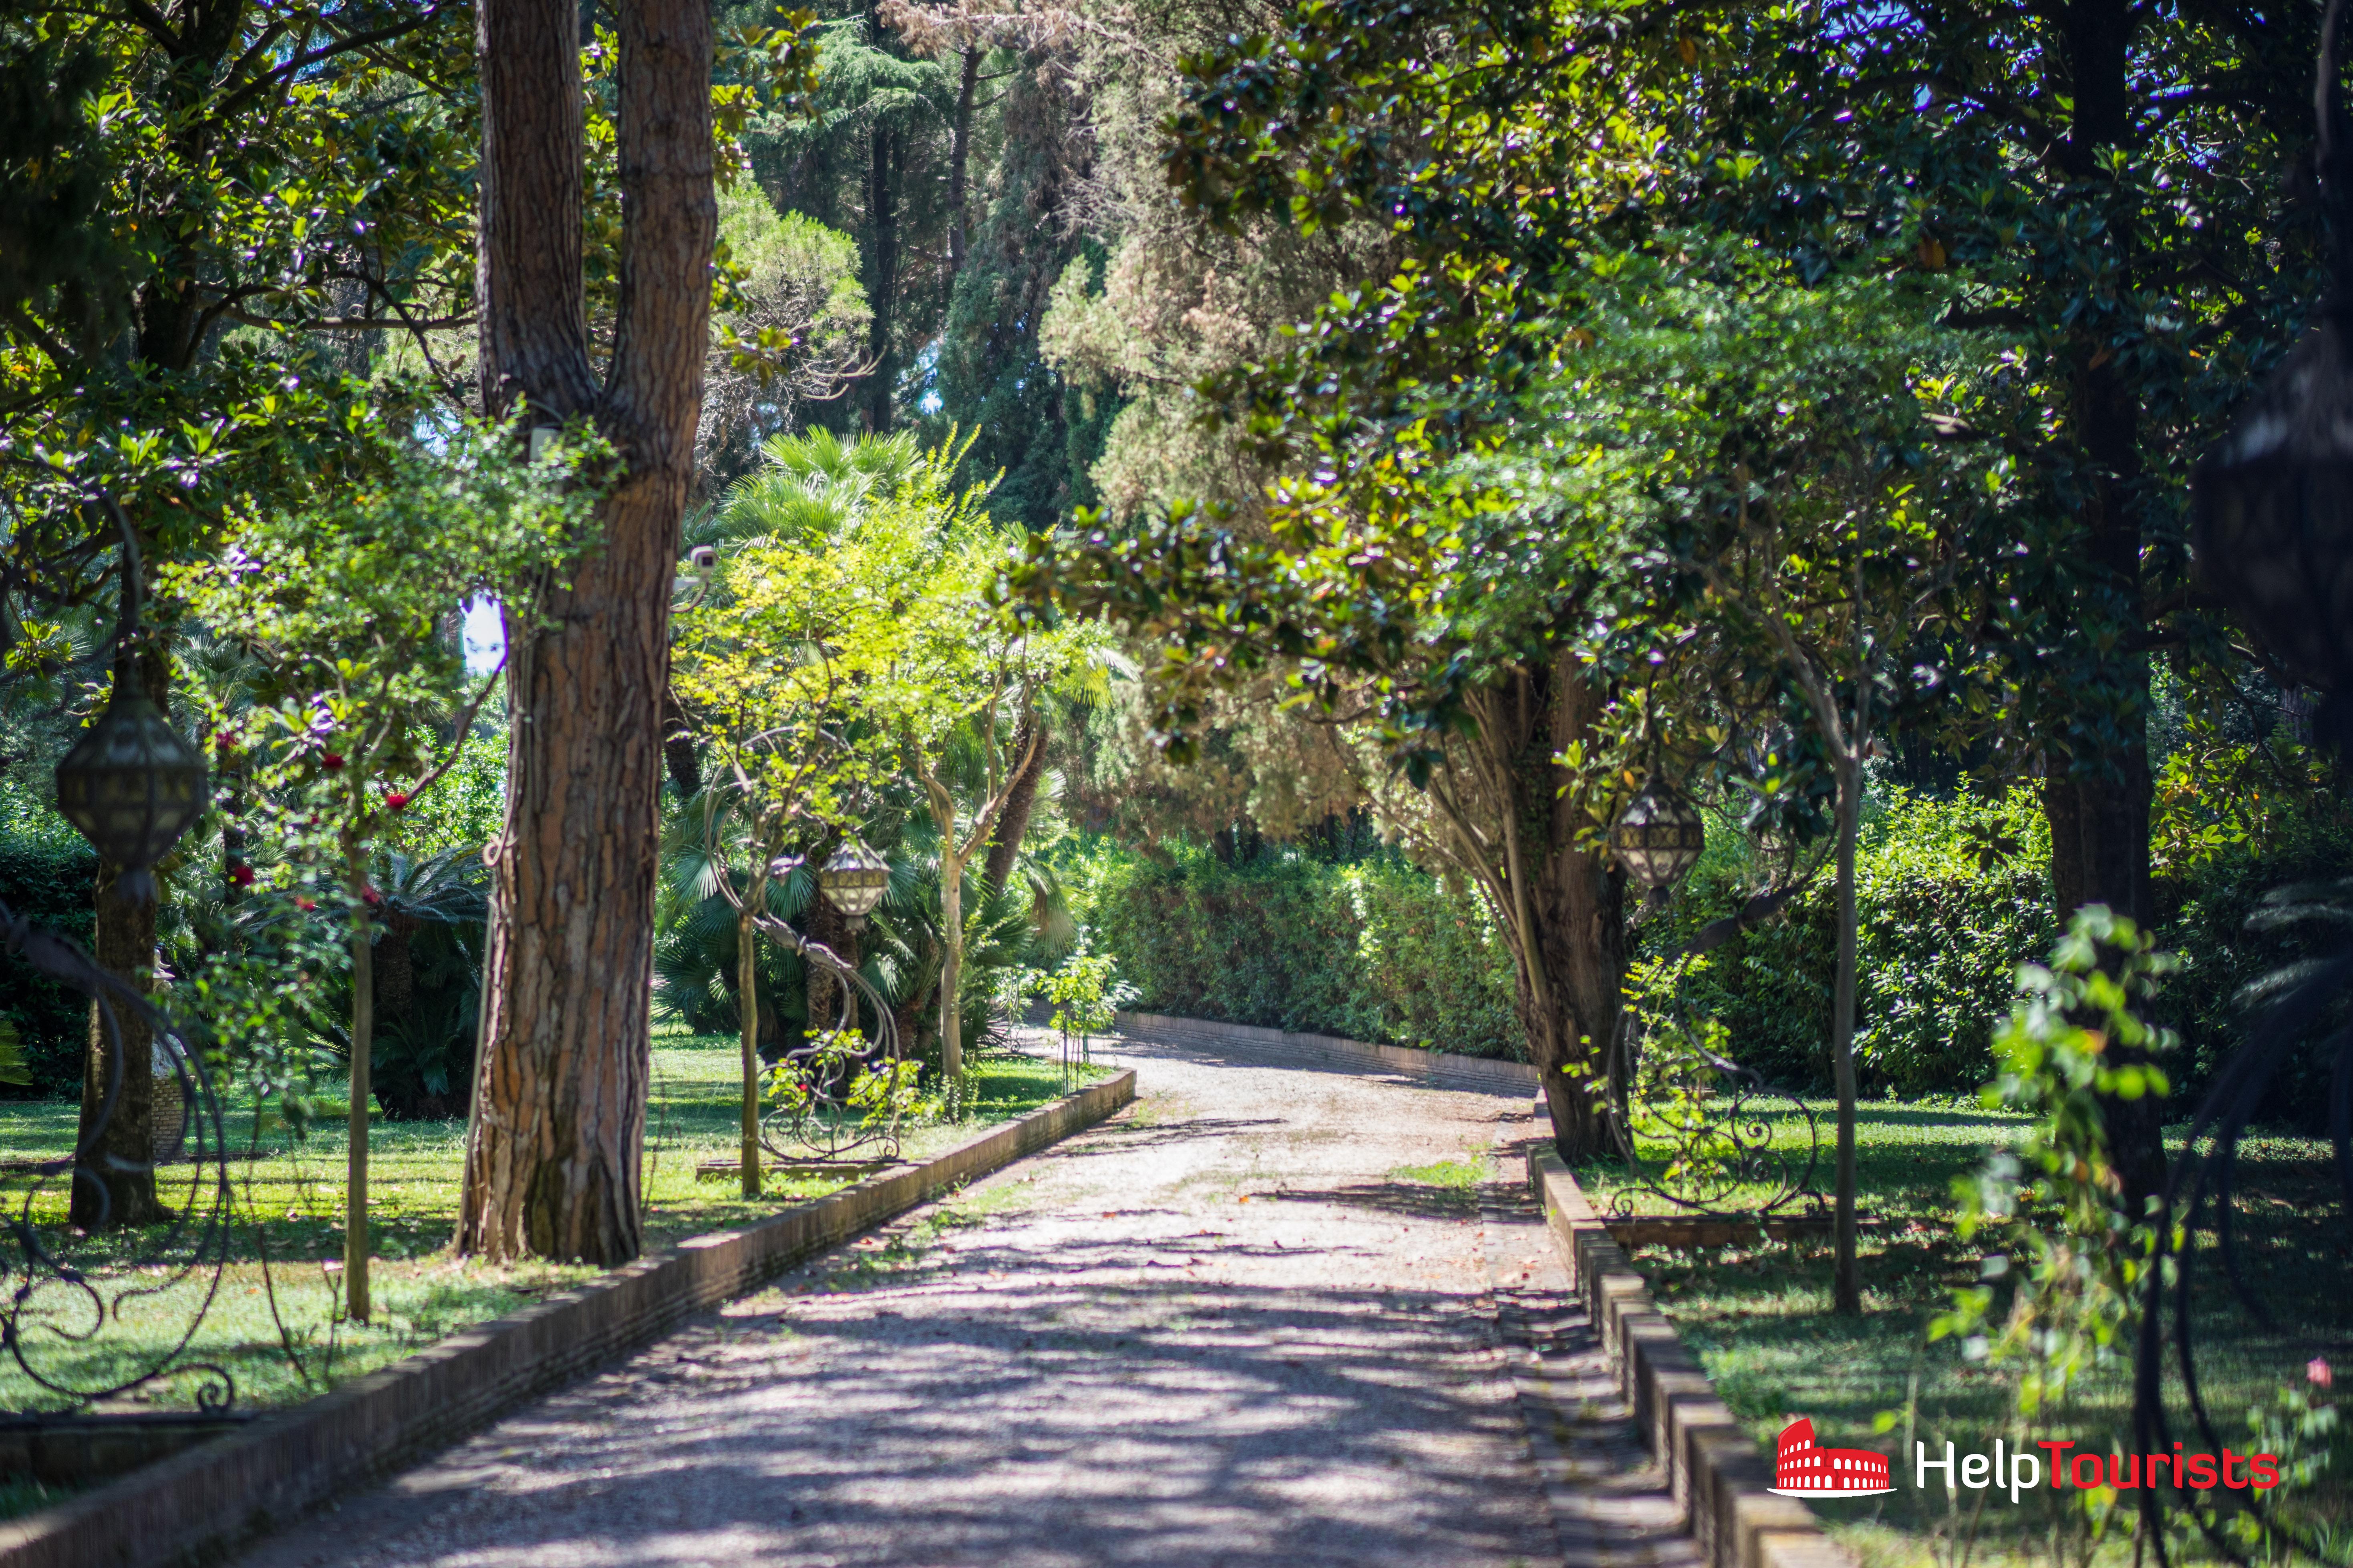 ROM_Via-Appia-Antica_Garten_l